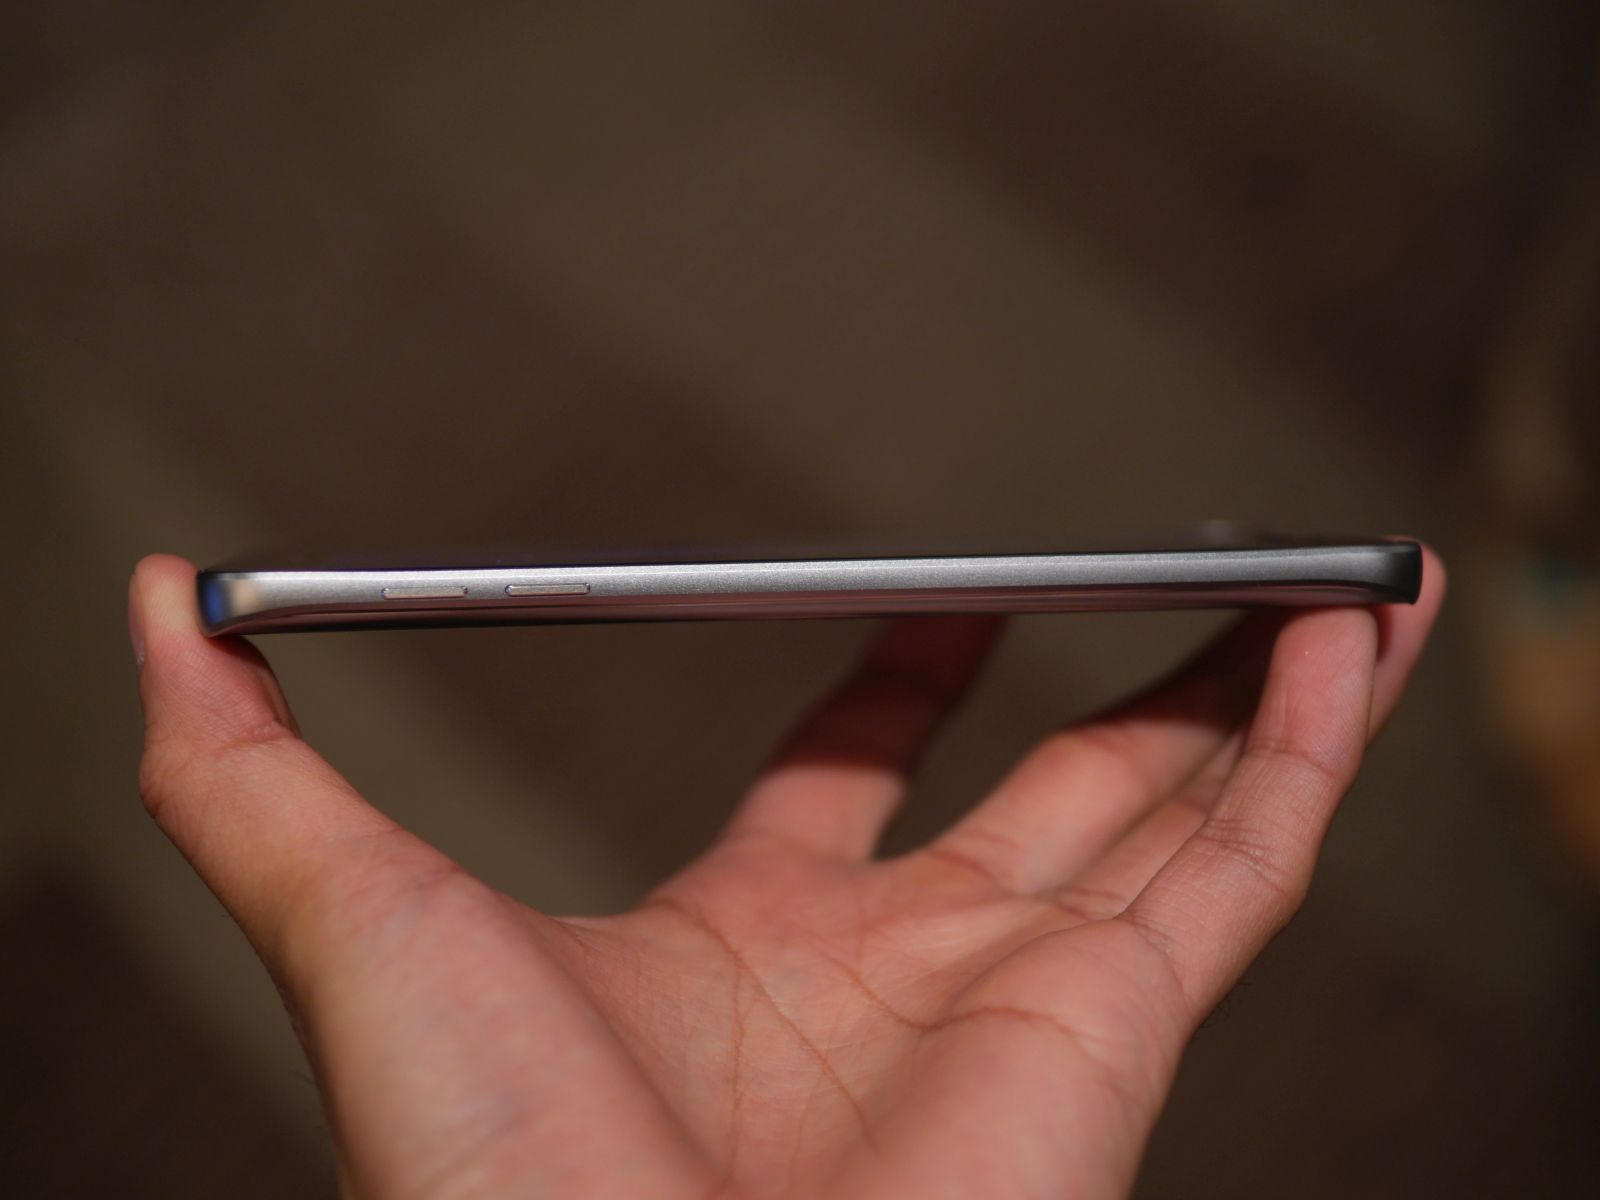 Samsung Galaxy S6 edge Plus 08